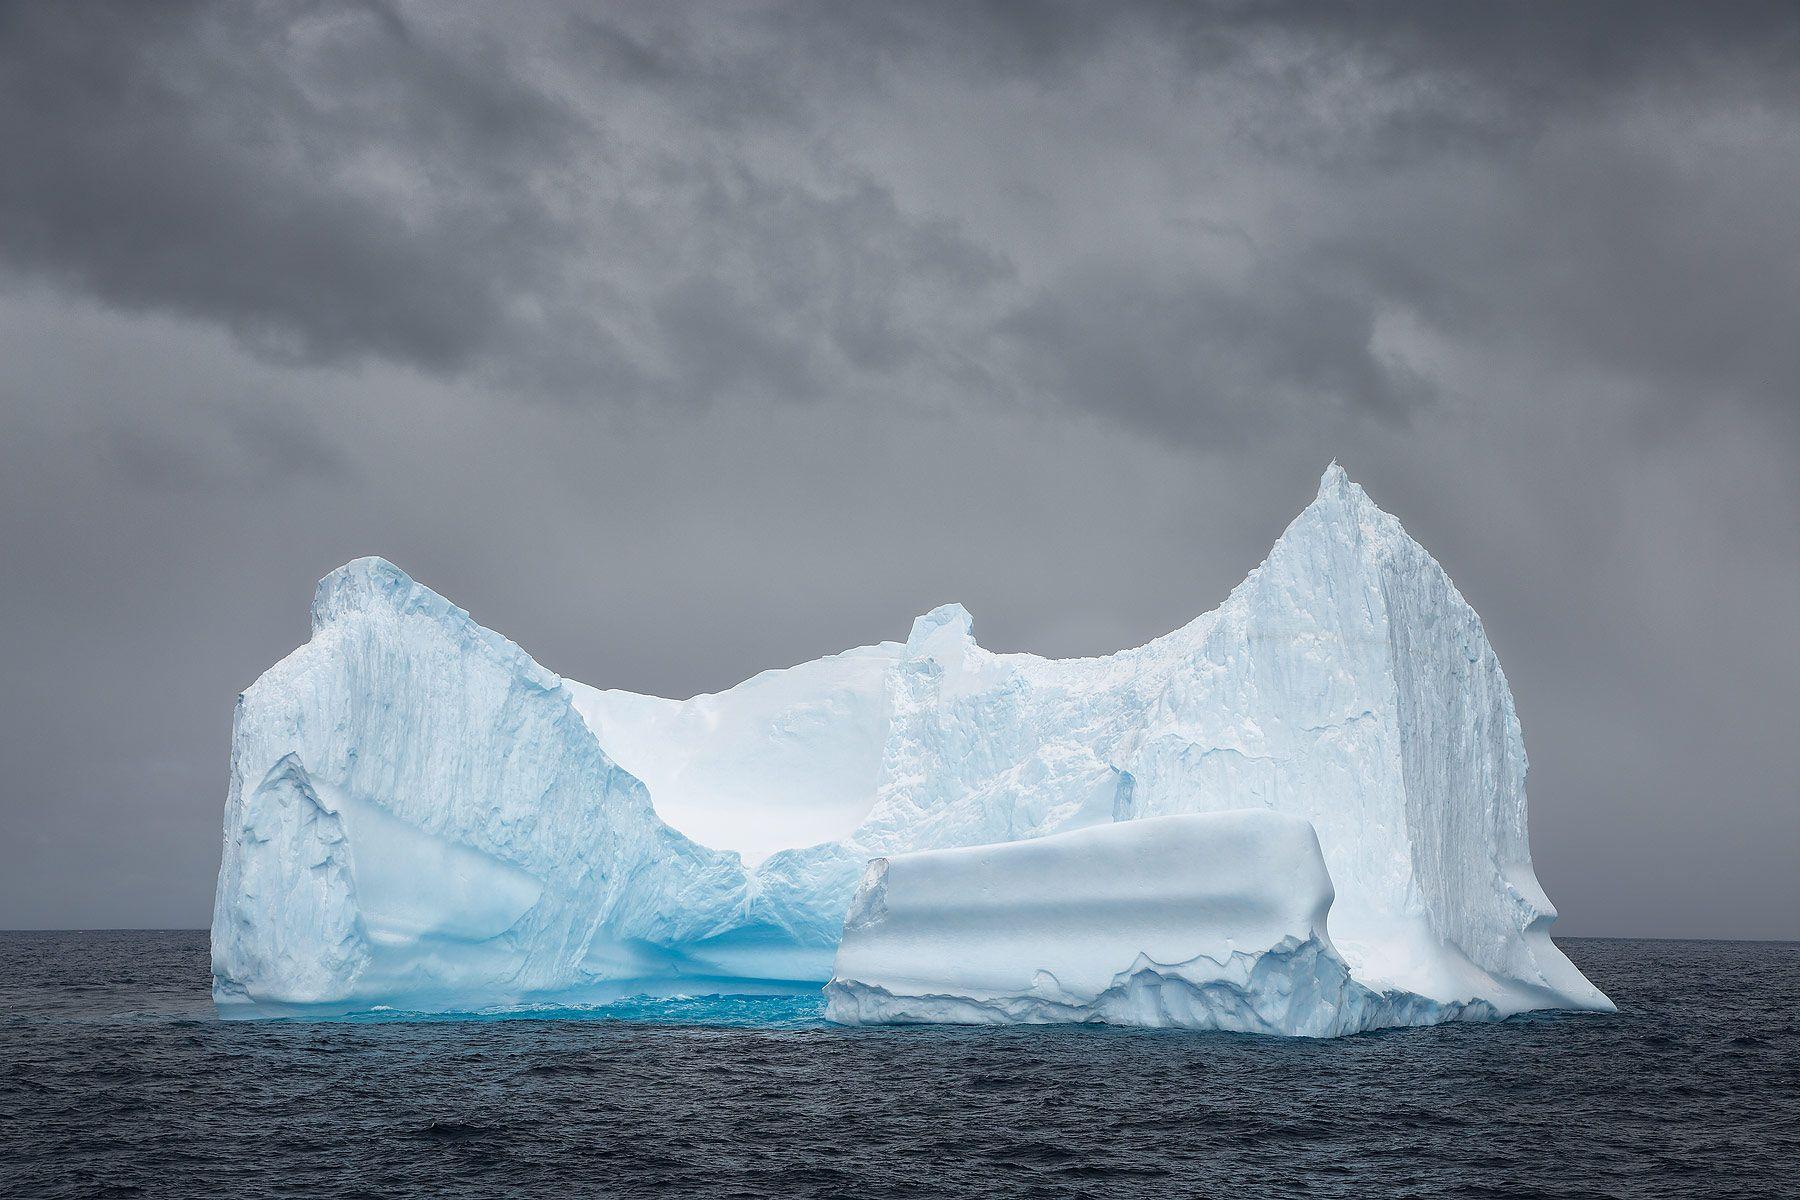 Ice-berg-floating_S6A1376-Drygalski-Fjord,-Cooper-Sound,-South-Georgia-Islands,-Southern-ocean.jpg